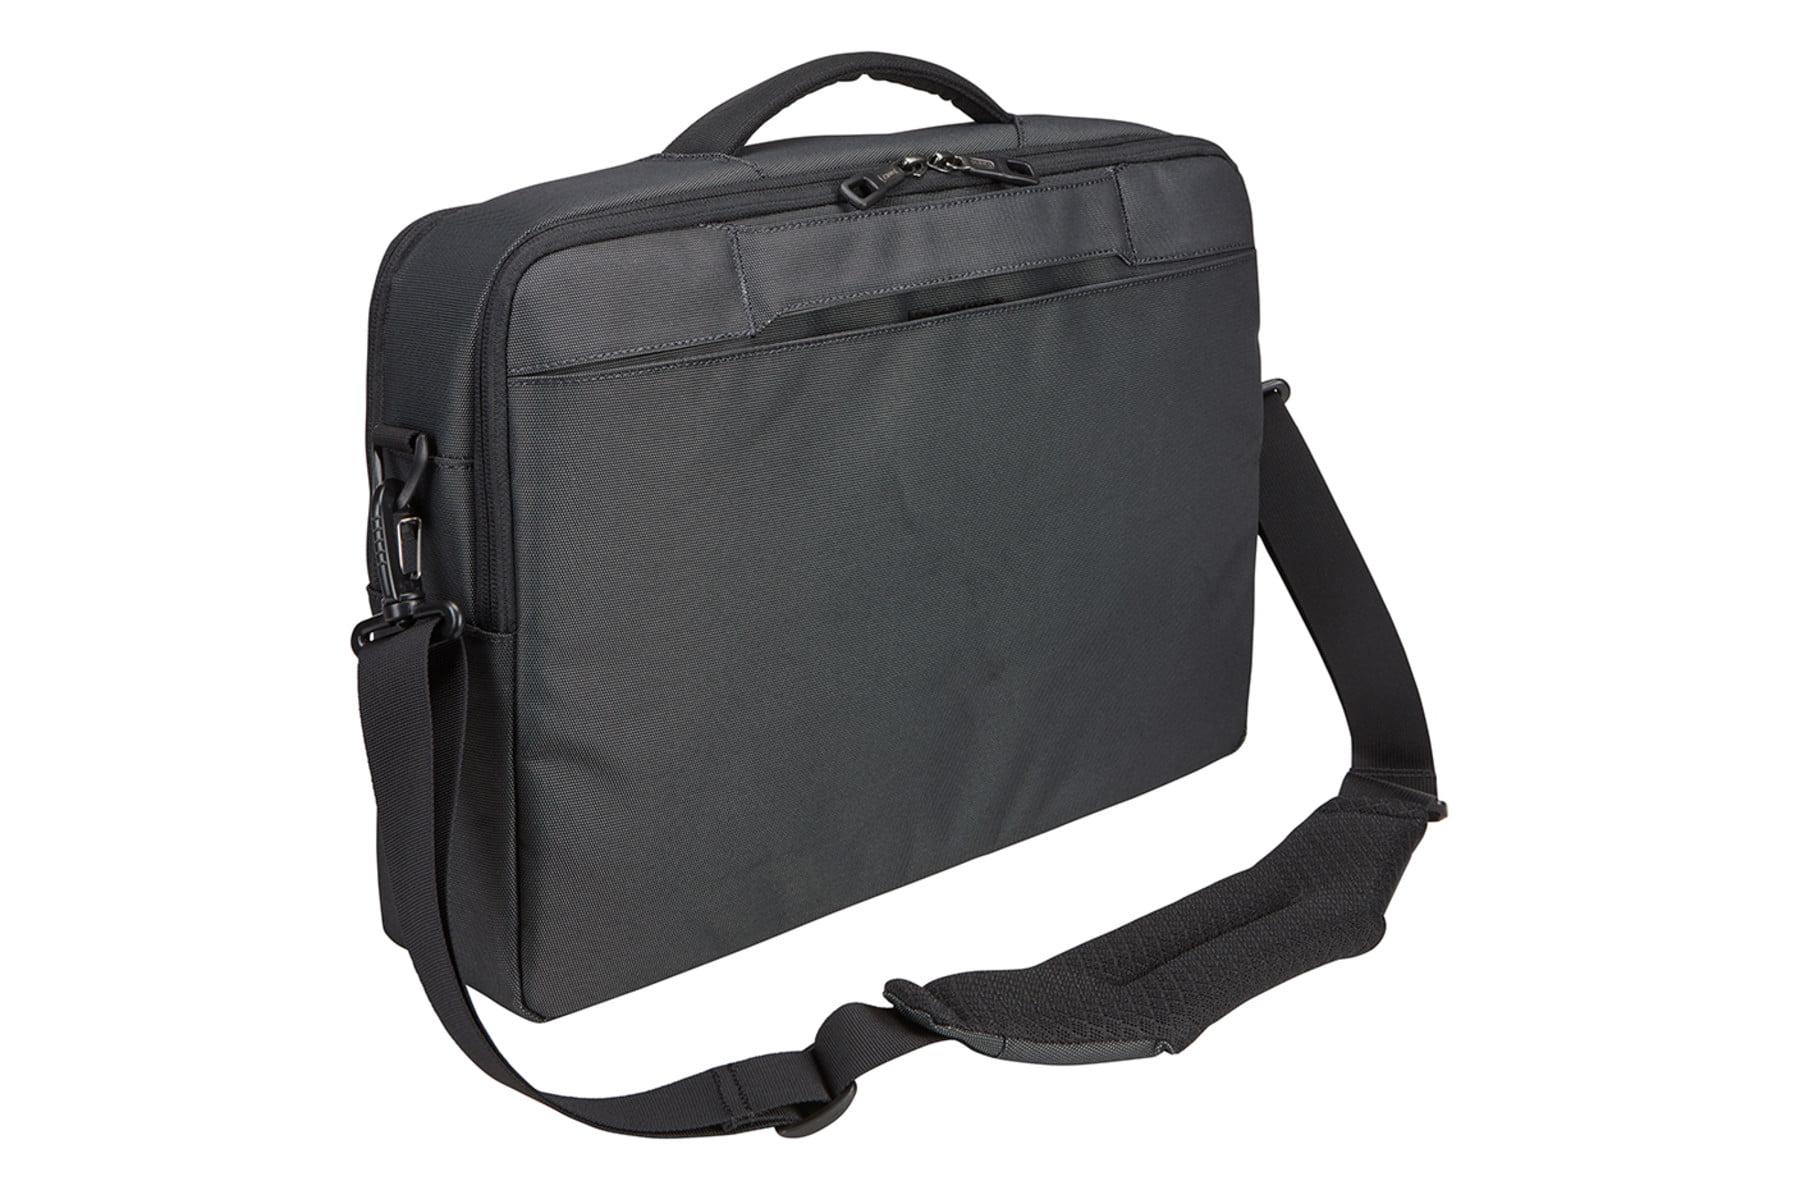 Geanta laptop Thule Subterra Laptop Bag 15.6 inchi 6